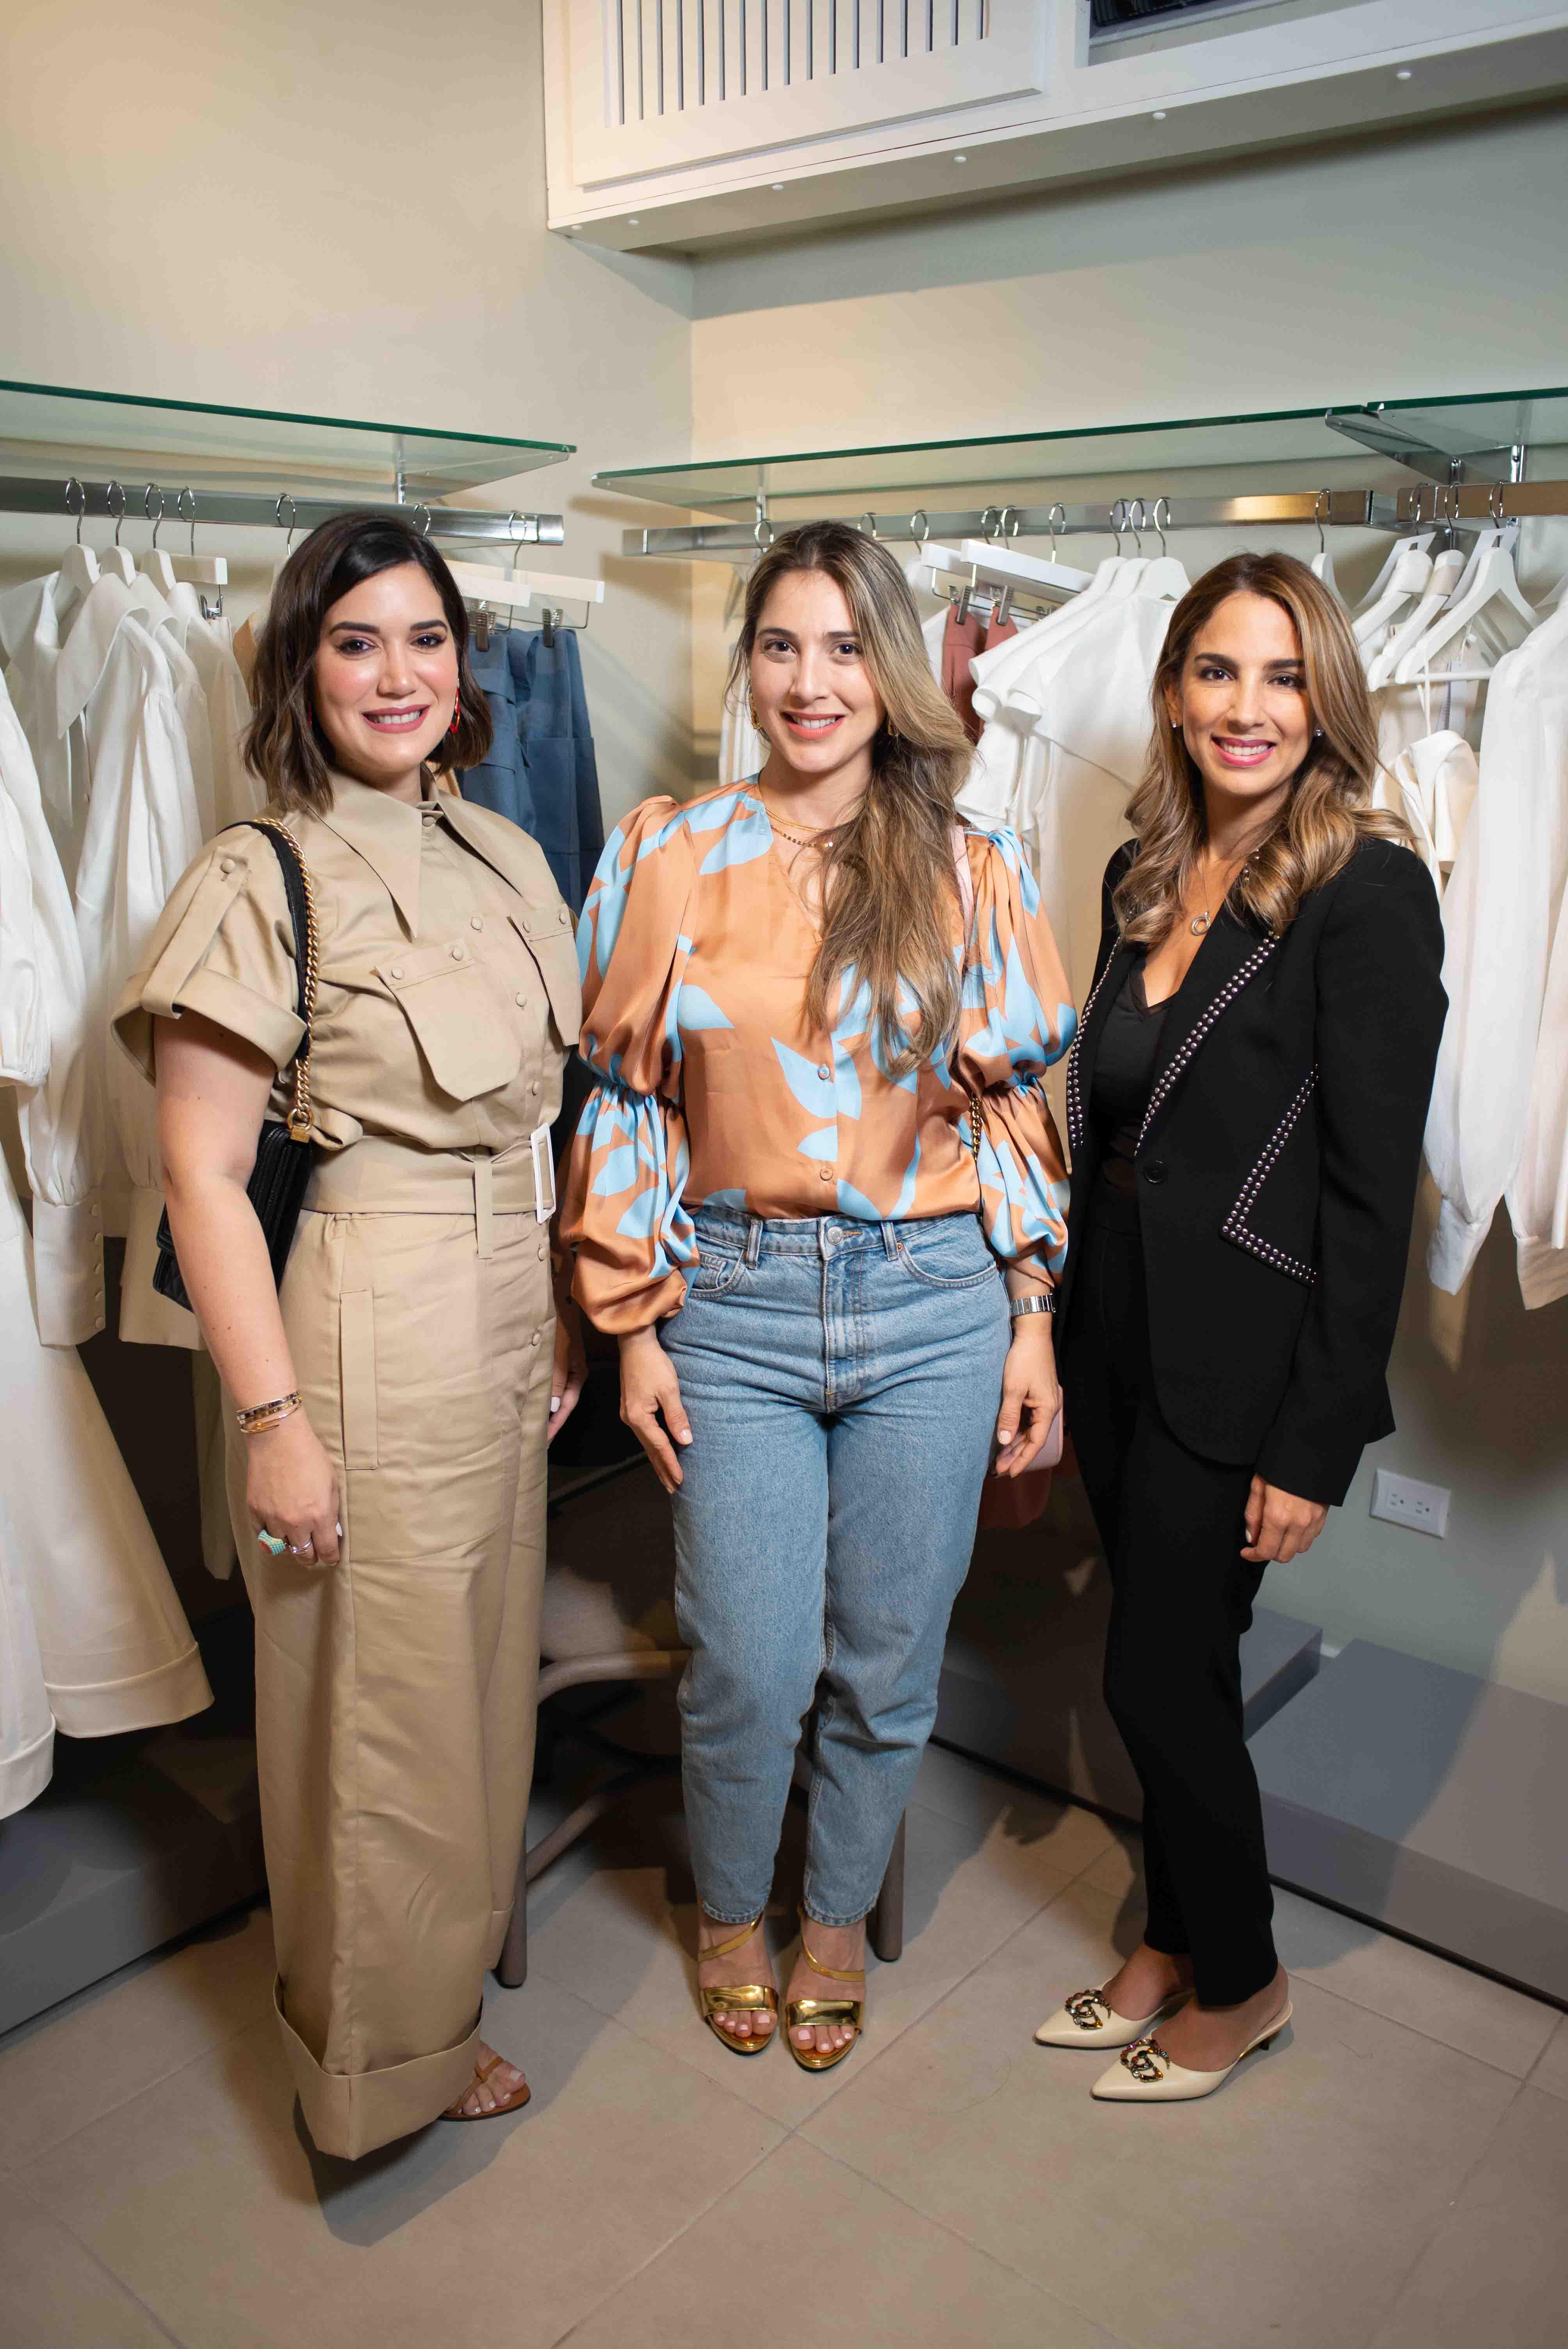 6. Maria Conchita Arcala, Laura Pellerano & Carolina Veras